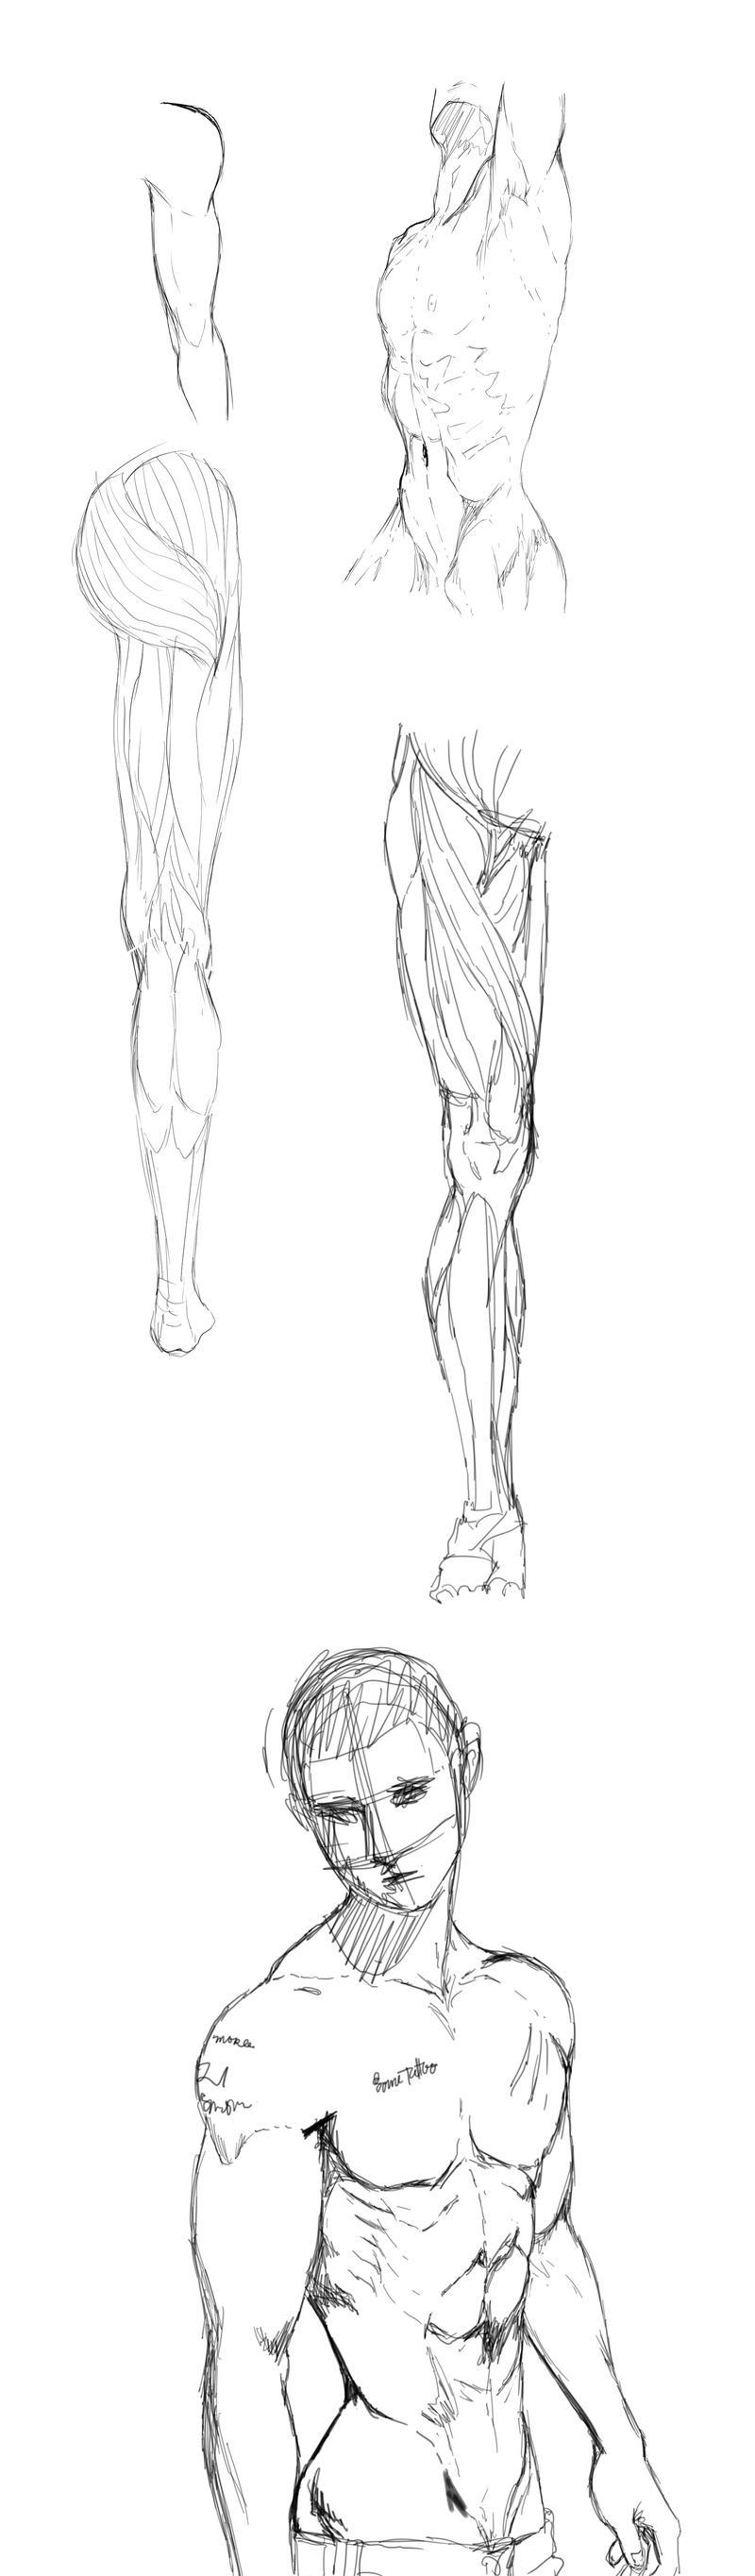 Guy Anatomy Practice By Snailords On Deviantart